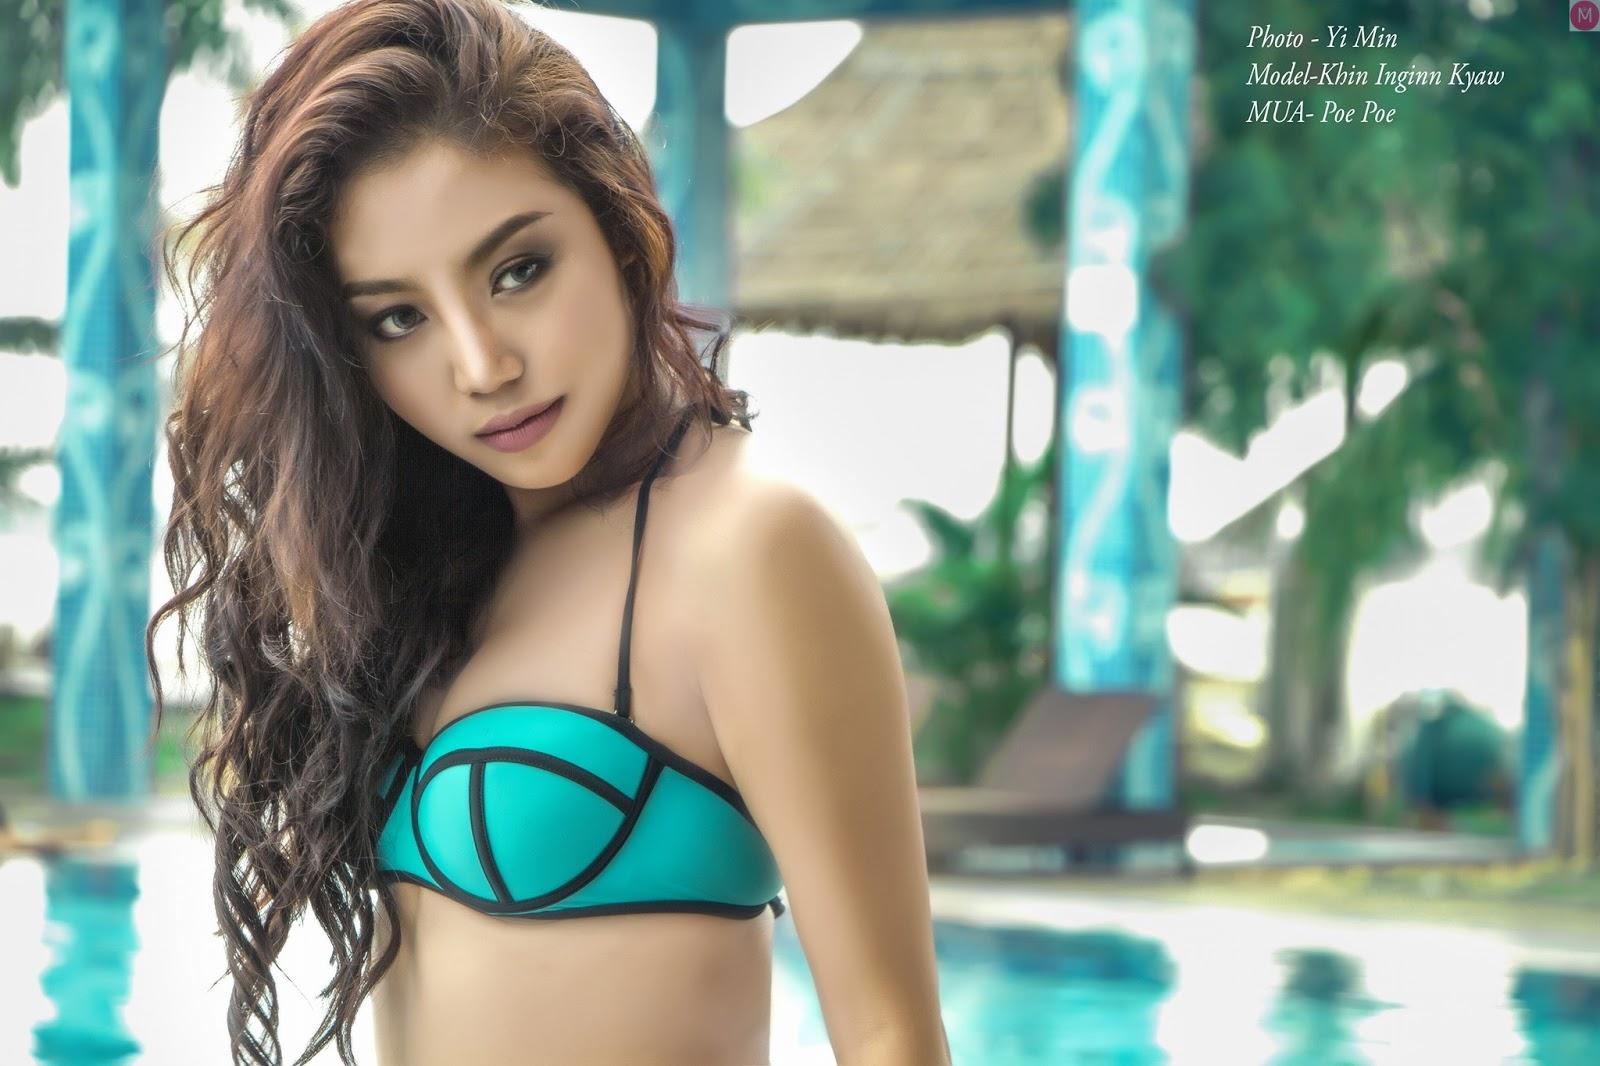 Myanmar Model Khin Injinn Kyaw Selection Album July Collection